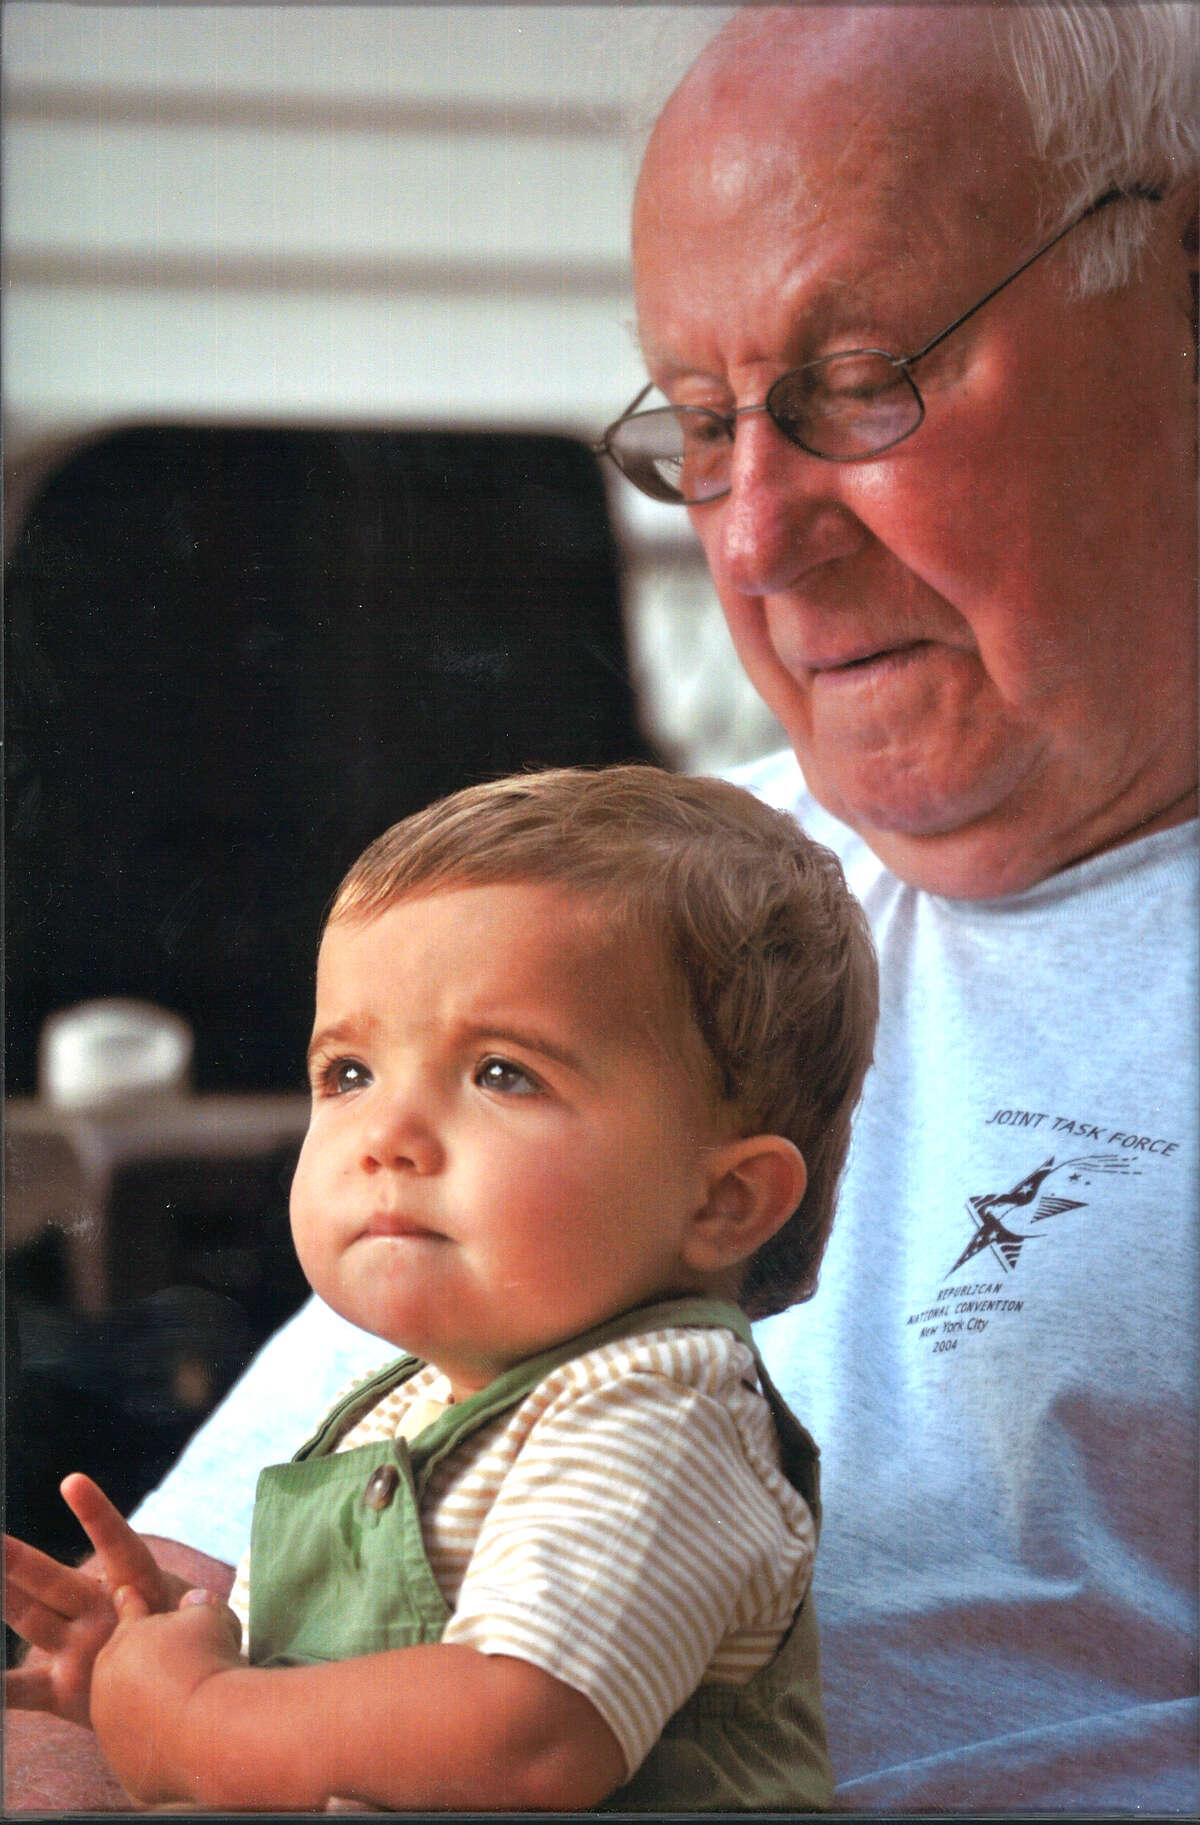 ?Happy Birthday Great Grandpa? Oct.4, 2012! 2 yr. old Joseph Michael Beaton of Rindge, New Hampshire is wishing his Great Grandpa, Michael J. Batza, Jr. of Colonie NY a very Happy Birthday along with his brother Gary Alan Beaton (not shown). Photo by Grandson Ryan Batza of Manchester, New Hampshire.